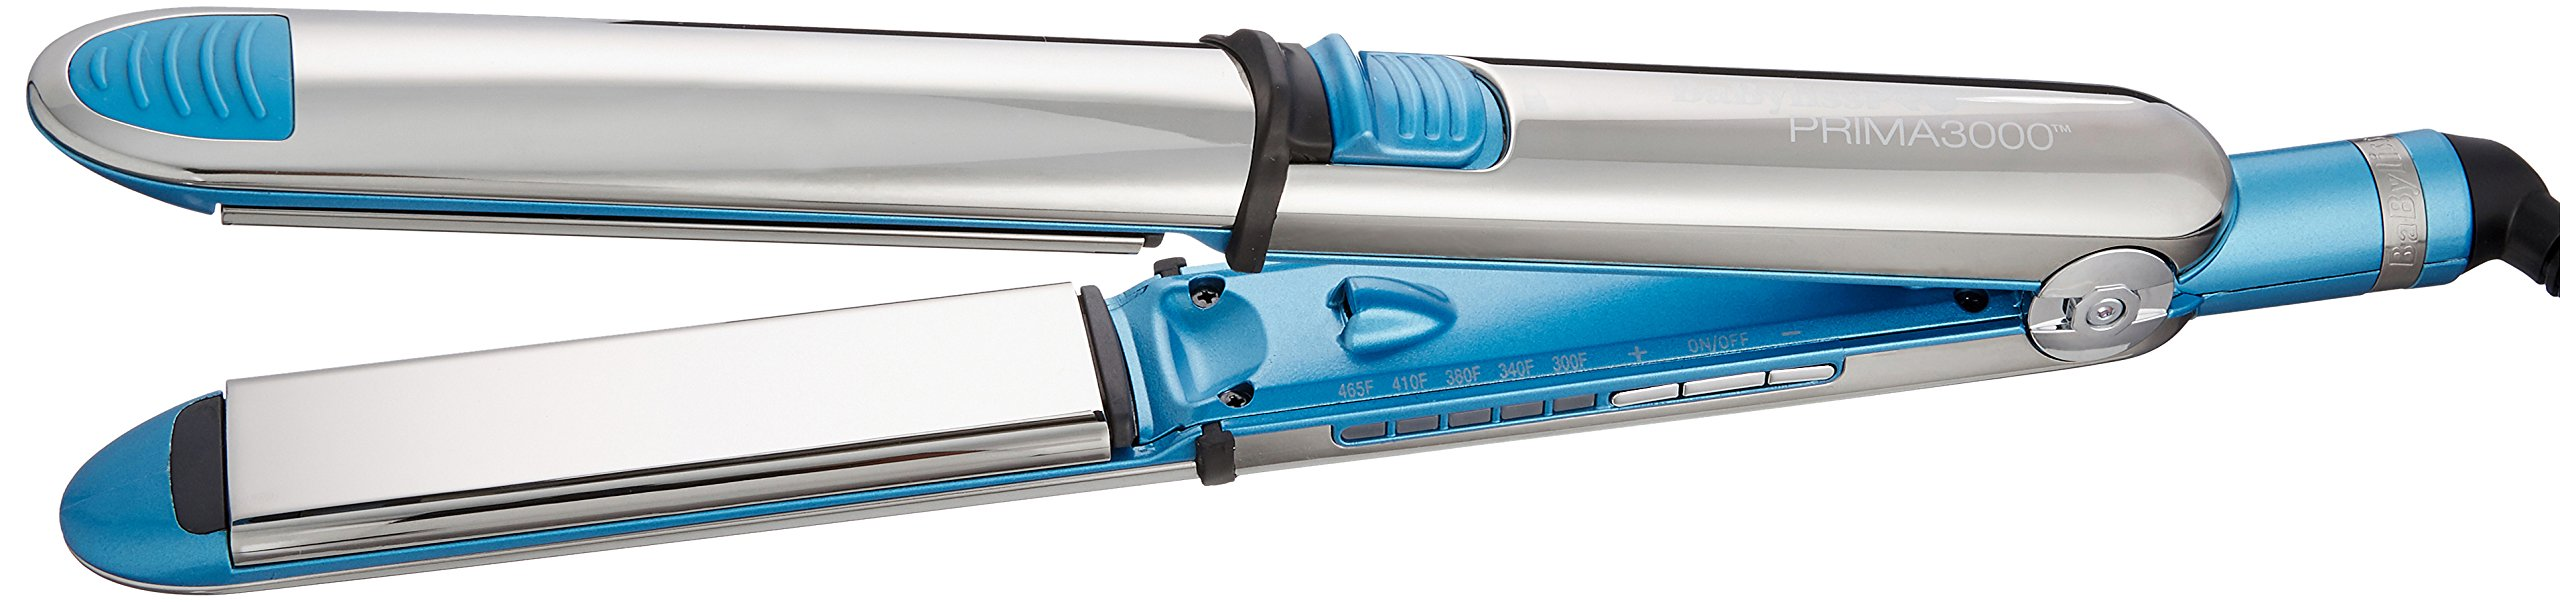 BaBylissPRO Nano Titanium Prima3000 Ionic Straightener, 1.25 Inch